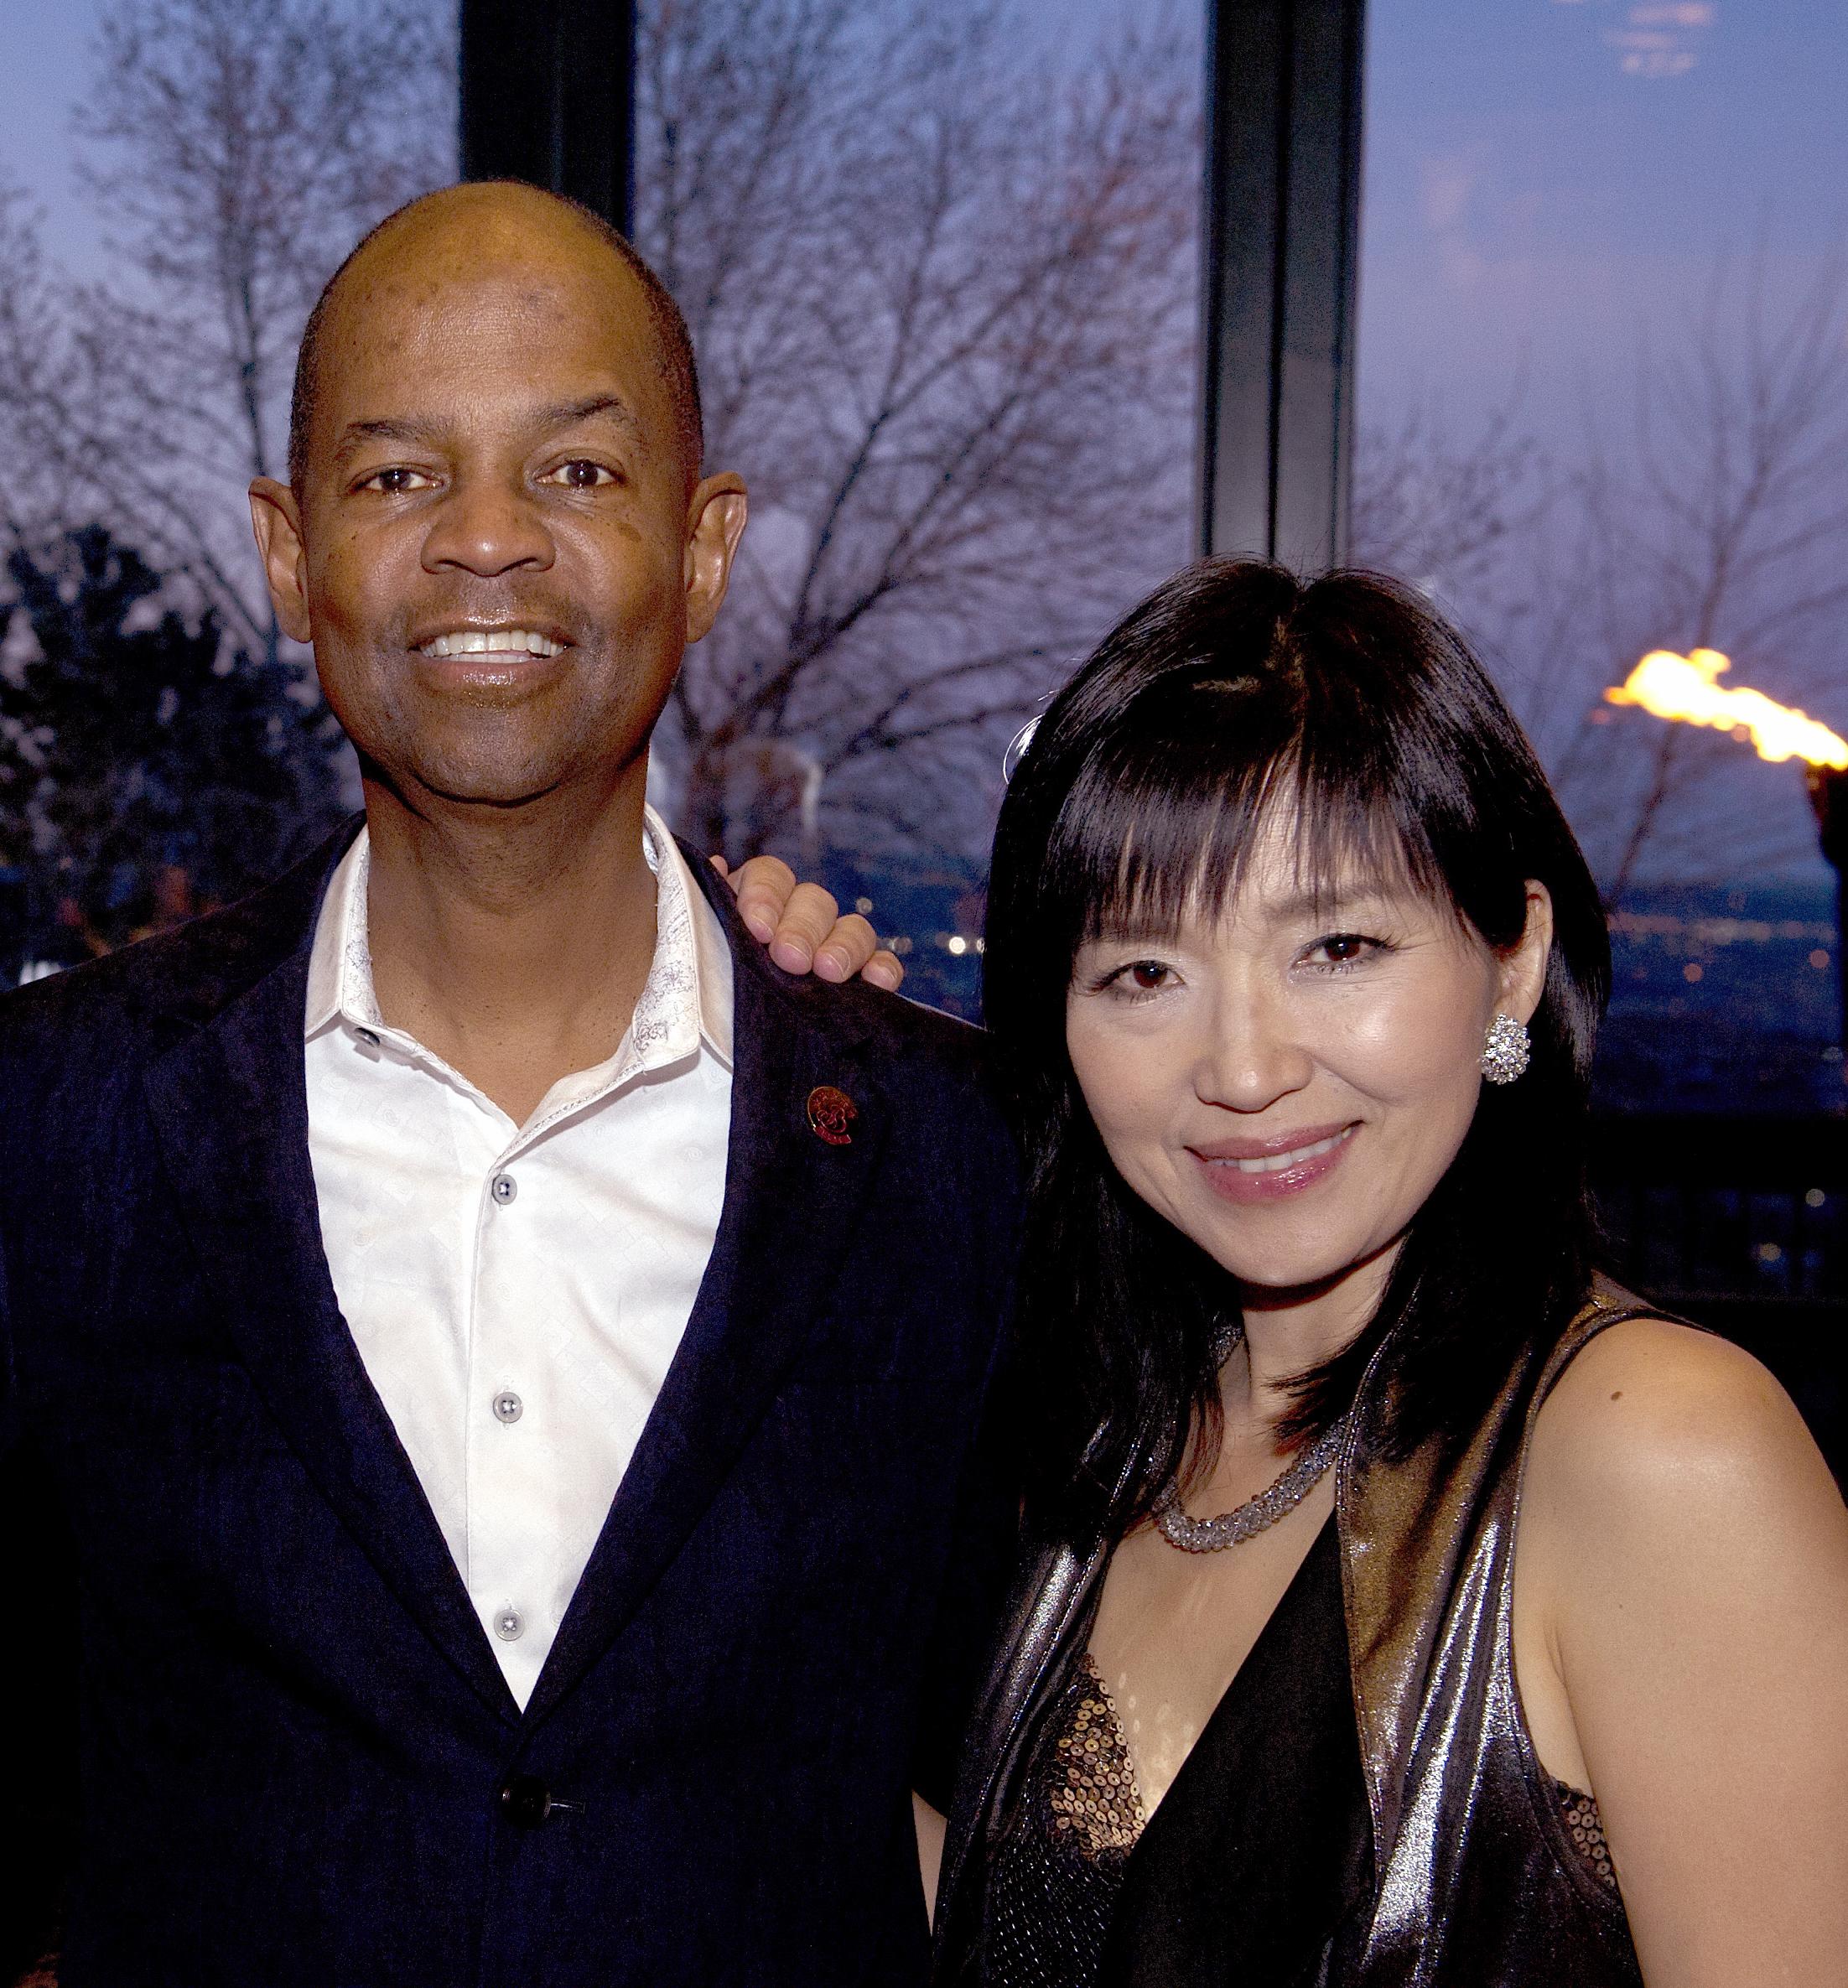 Earl Klugh & Keiko Matsui at Newport Beach!